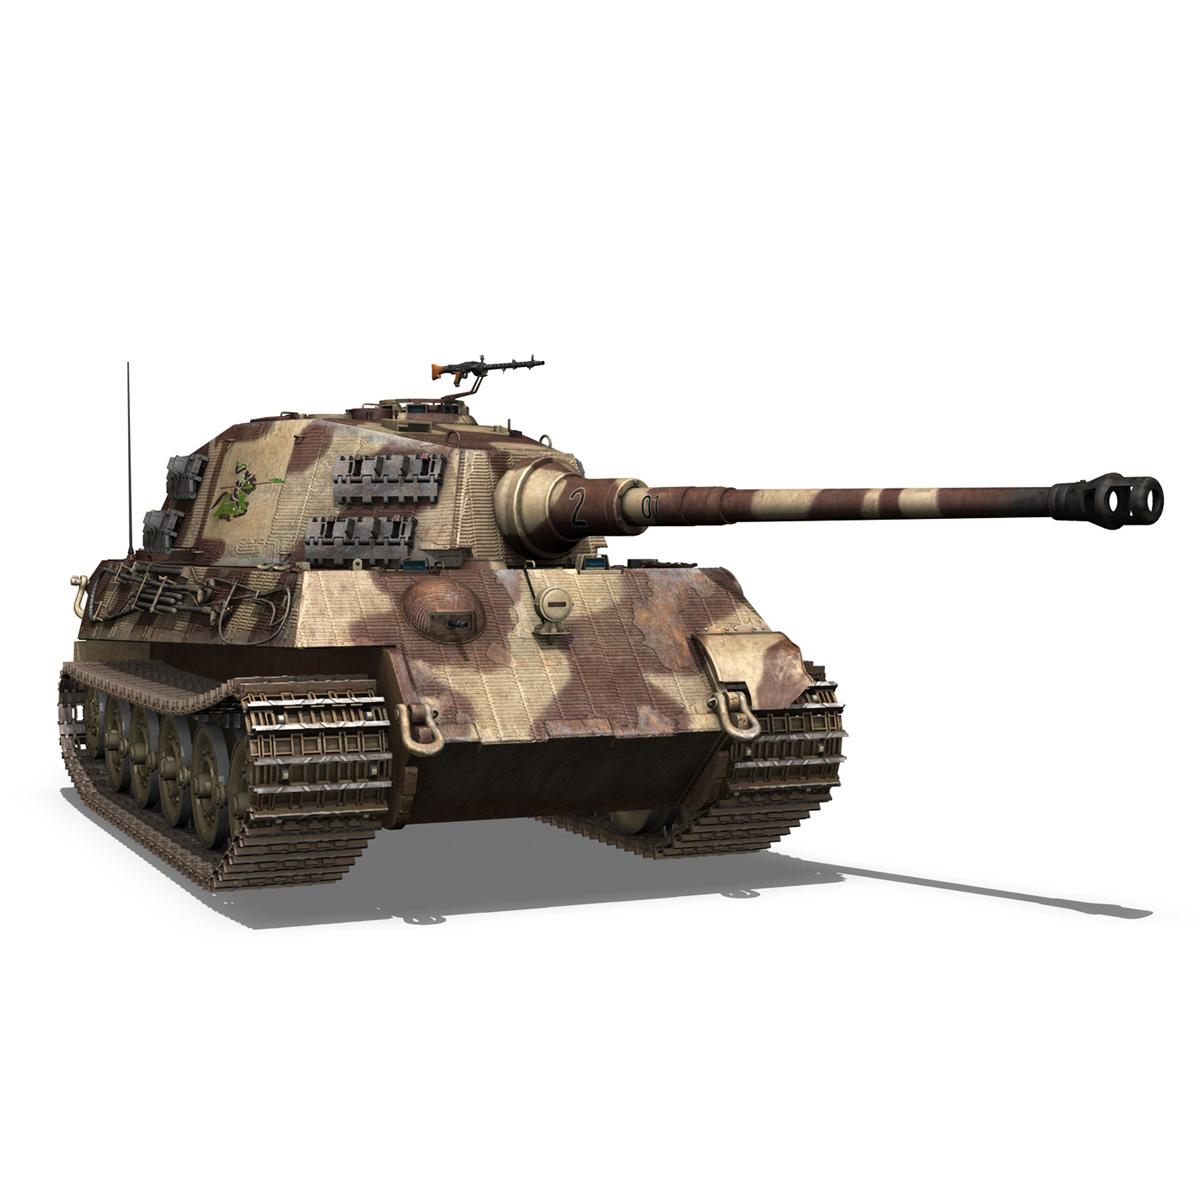 panzerkampfwagen vi – ausf b – tiger ii – 201 3d model 3ds c4d lwo lw lws obj 293309